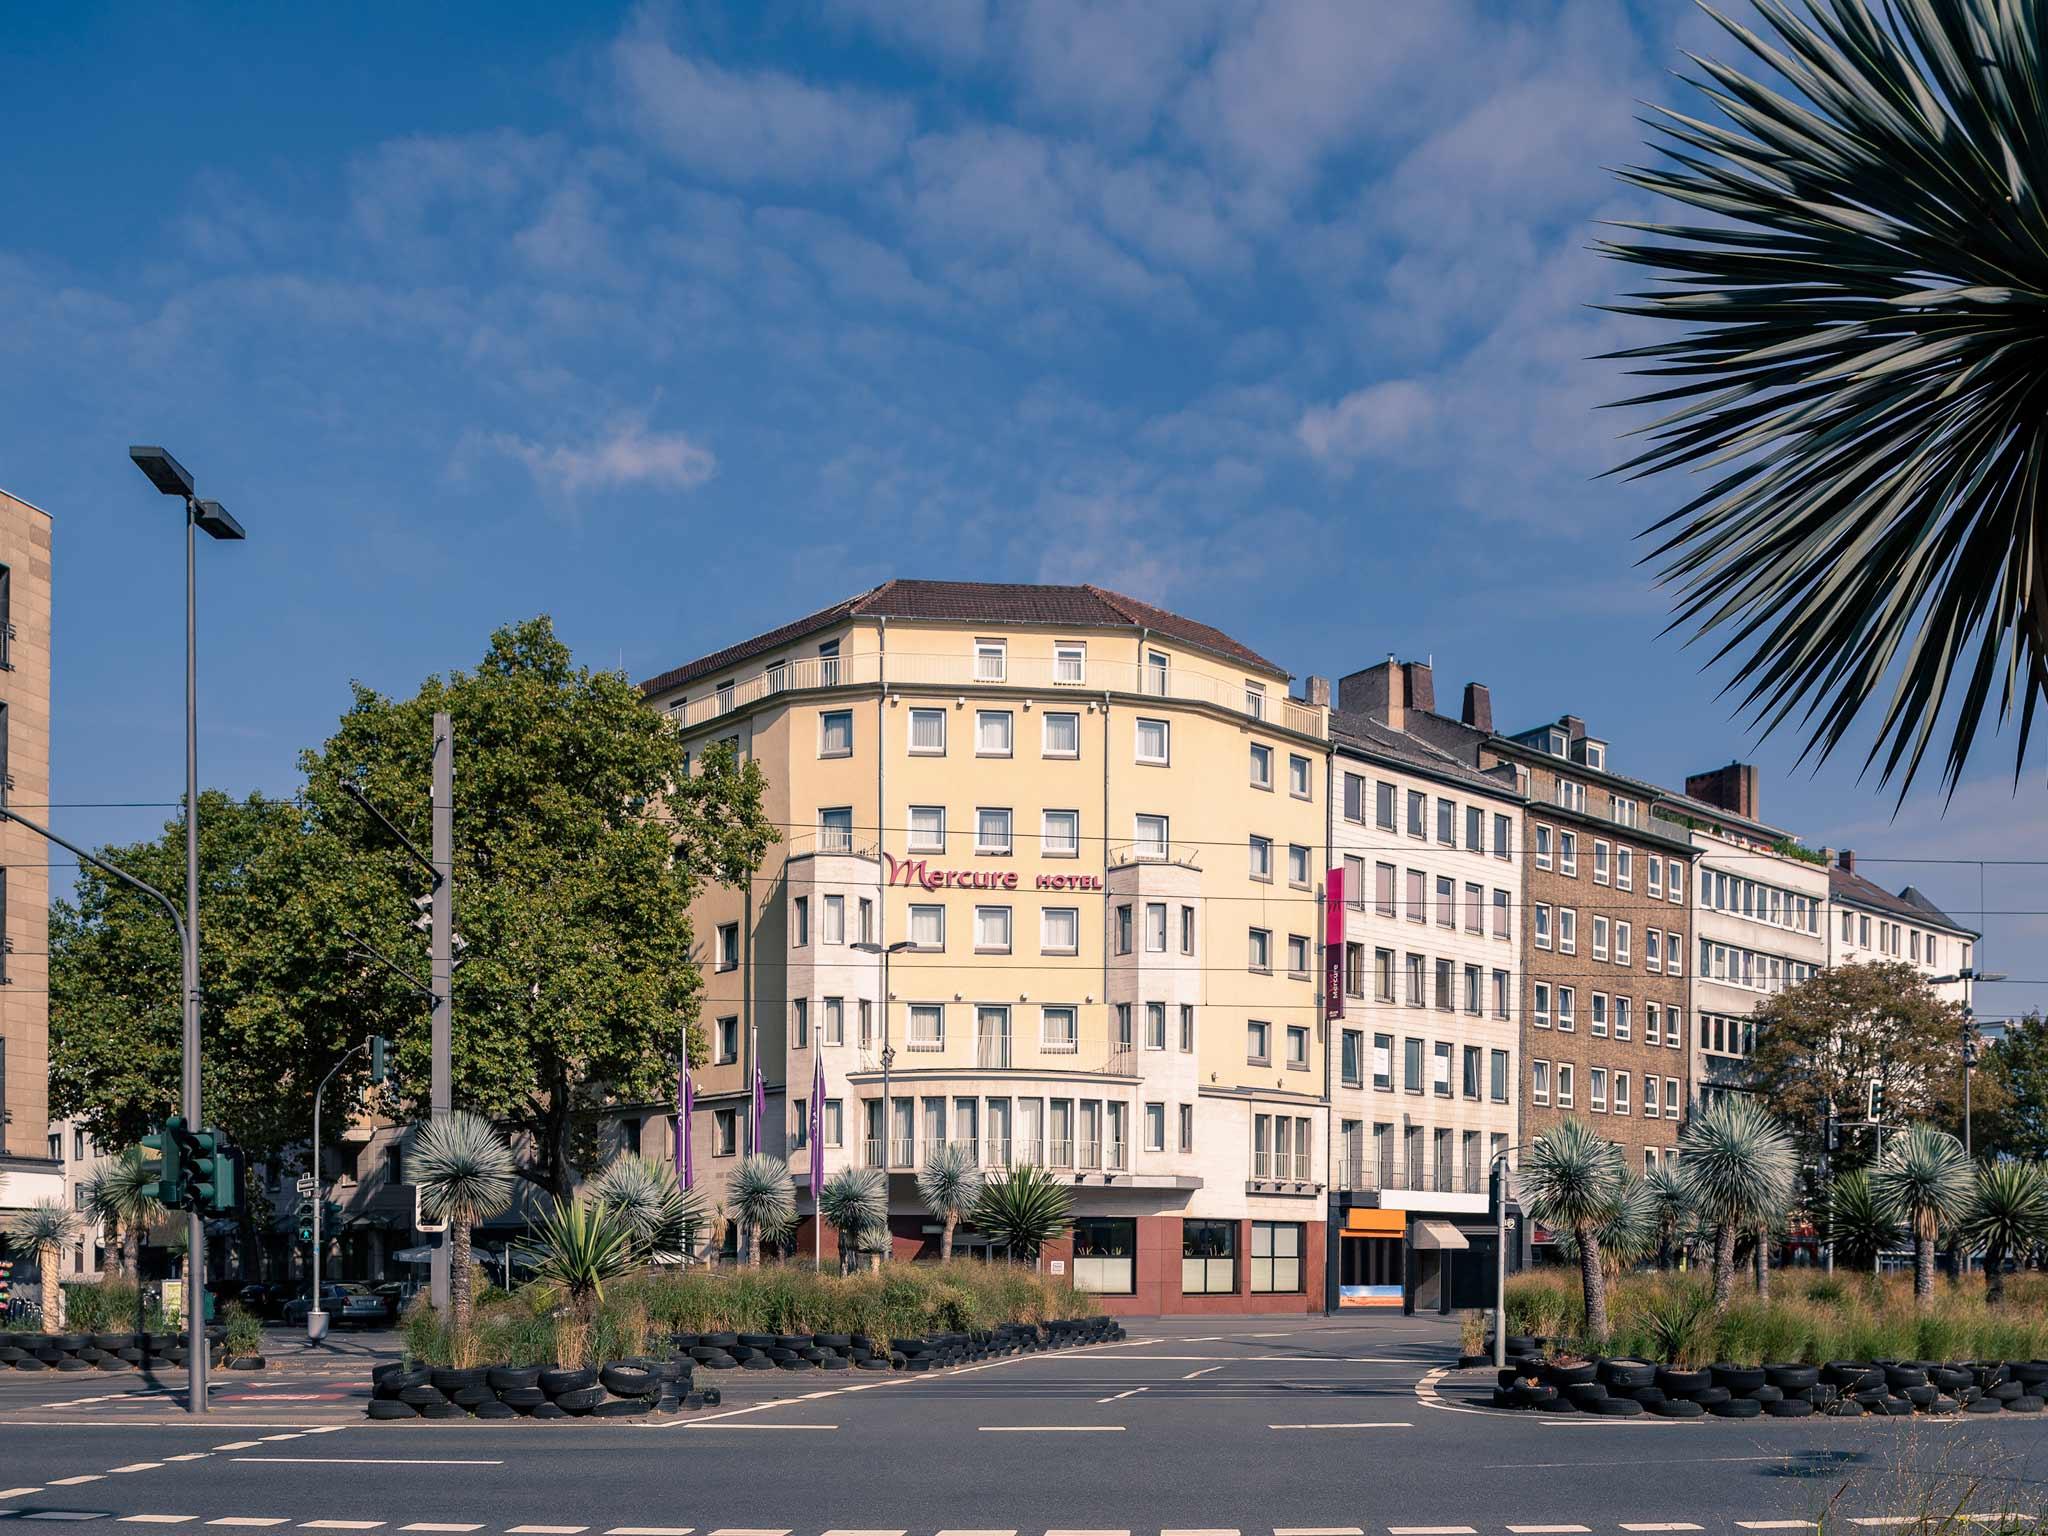 Hôtel - Mercure Hotel Duesseldorf City Center